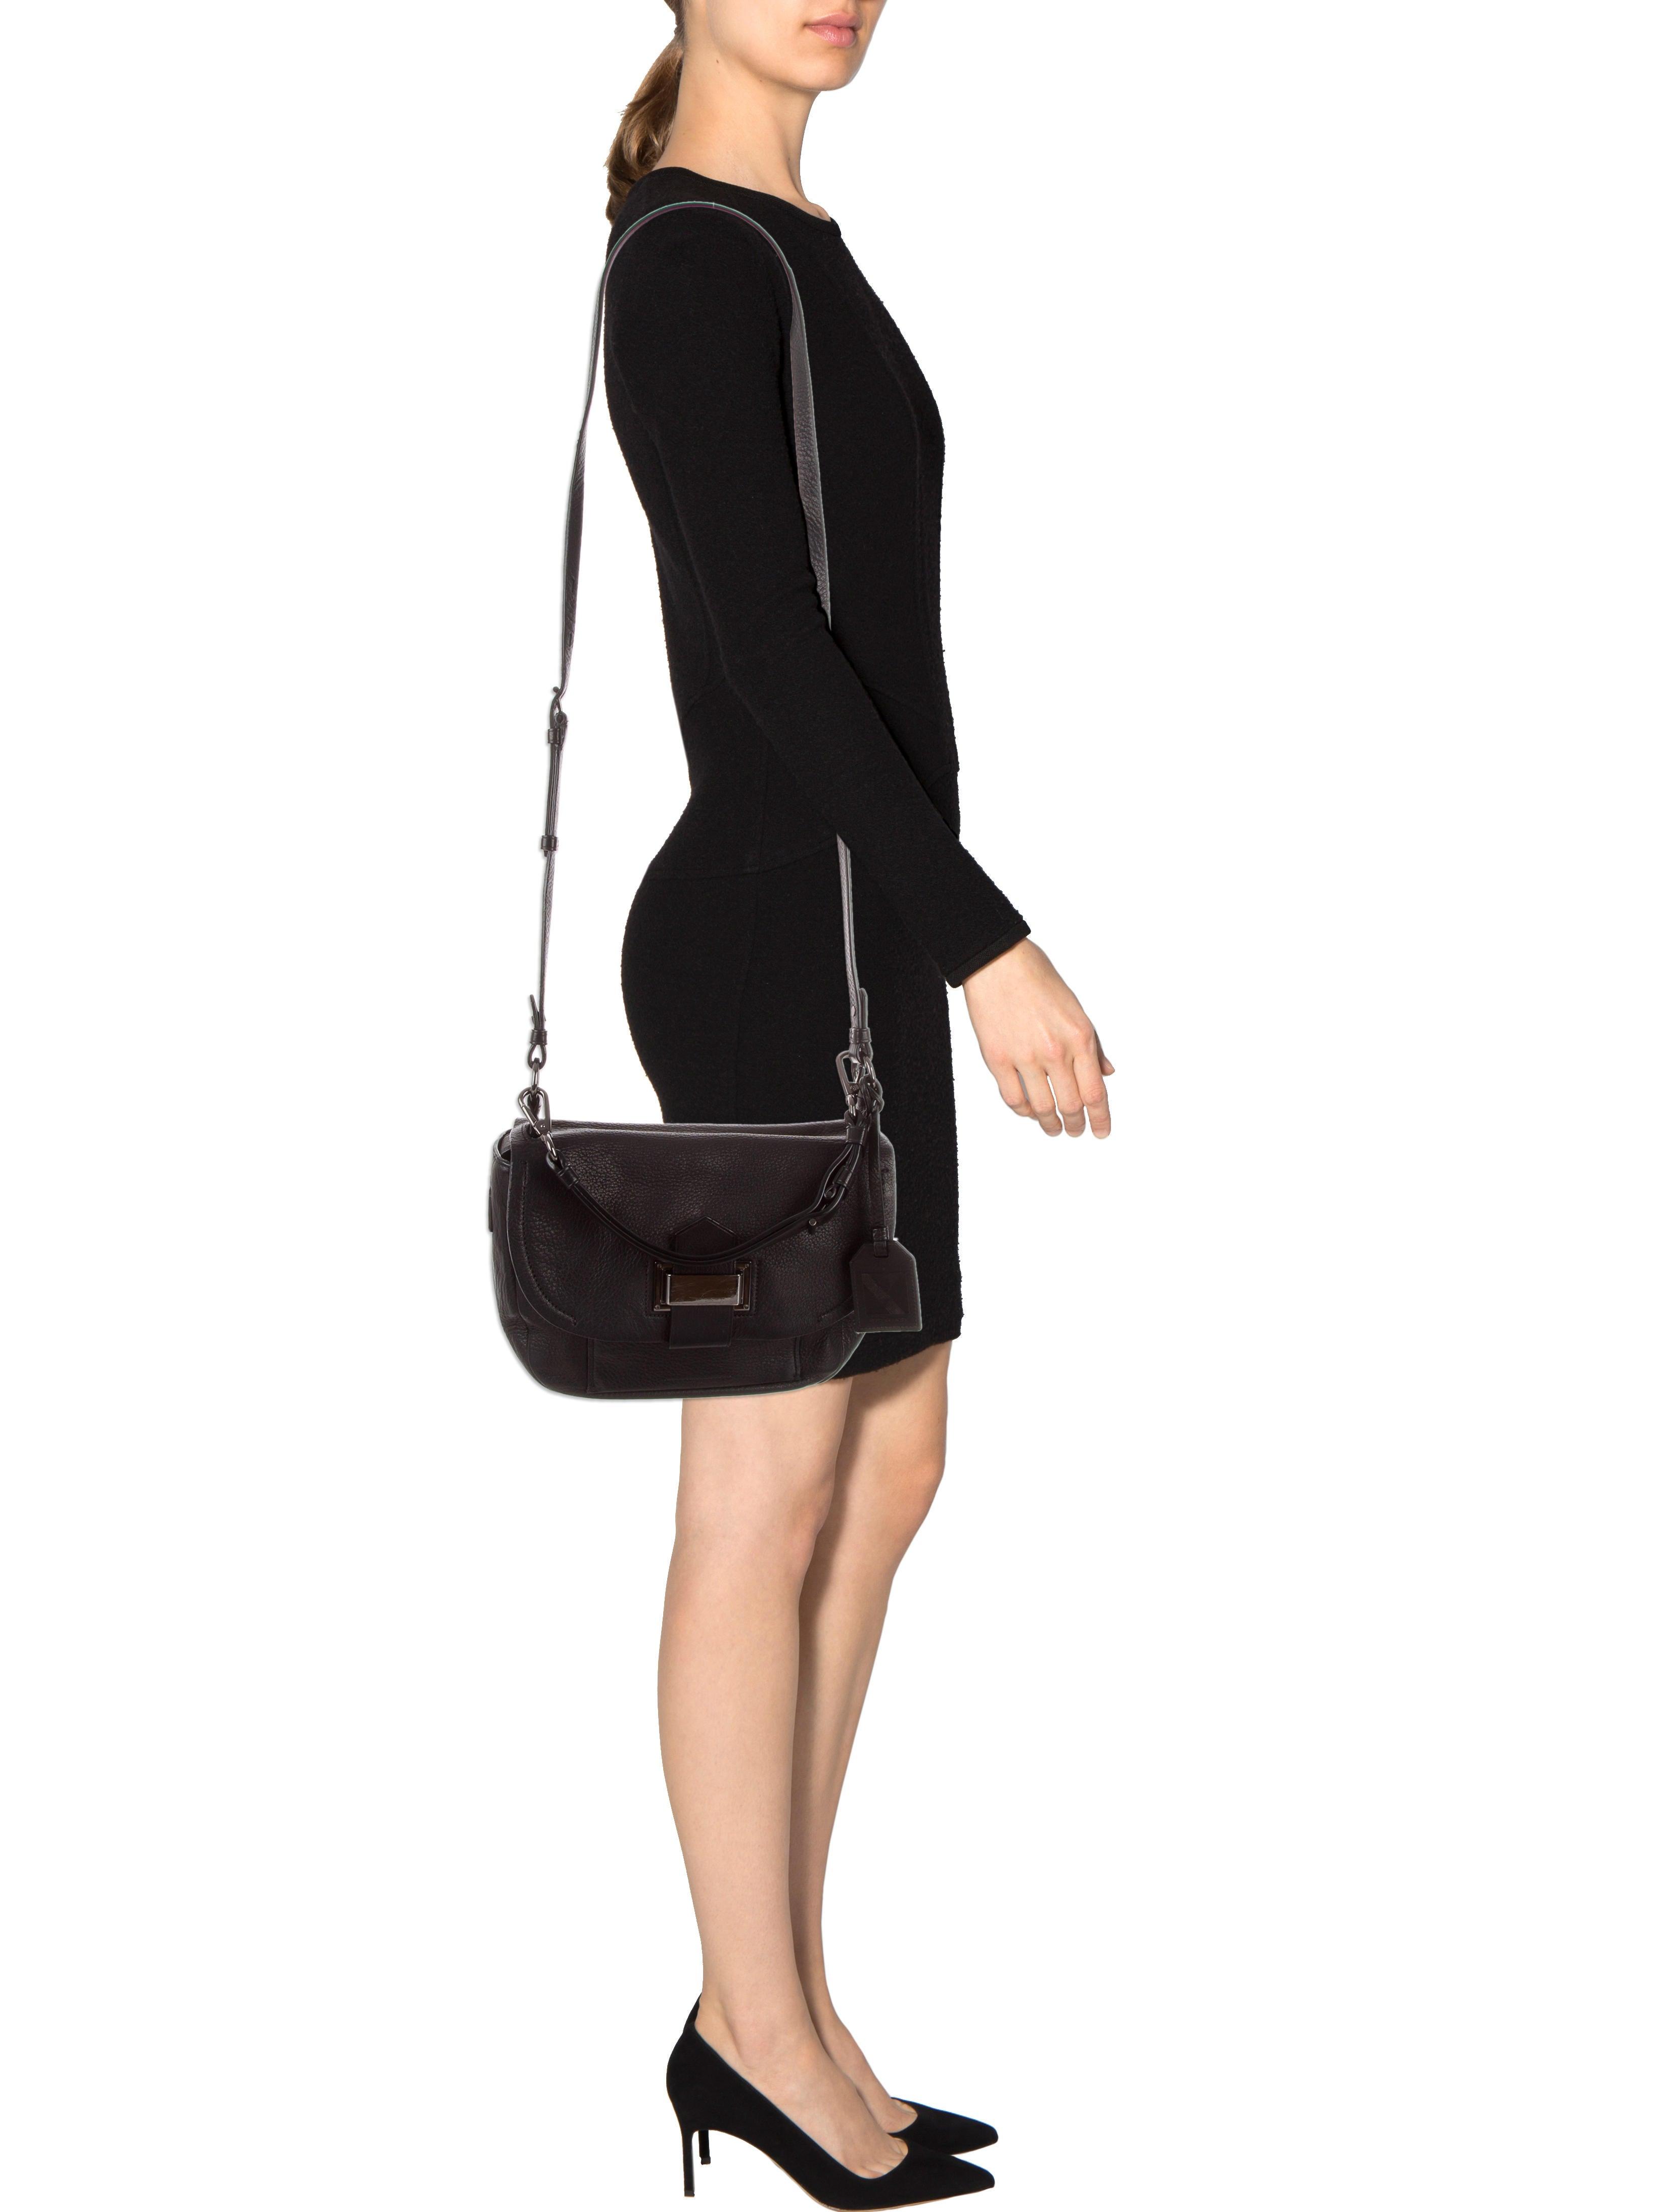 Reed Krakoff Kit Bag Handbags REE29526 The RealReal : REE295262enlarged from www.therealreal.com size 3316 x 4376 jpeg 352kB